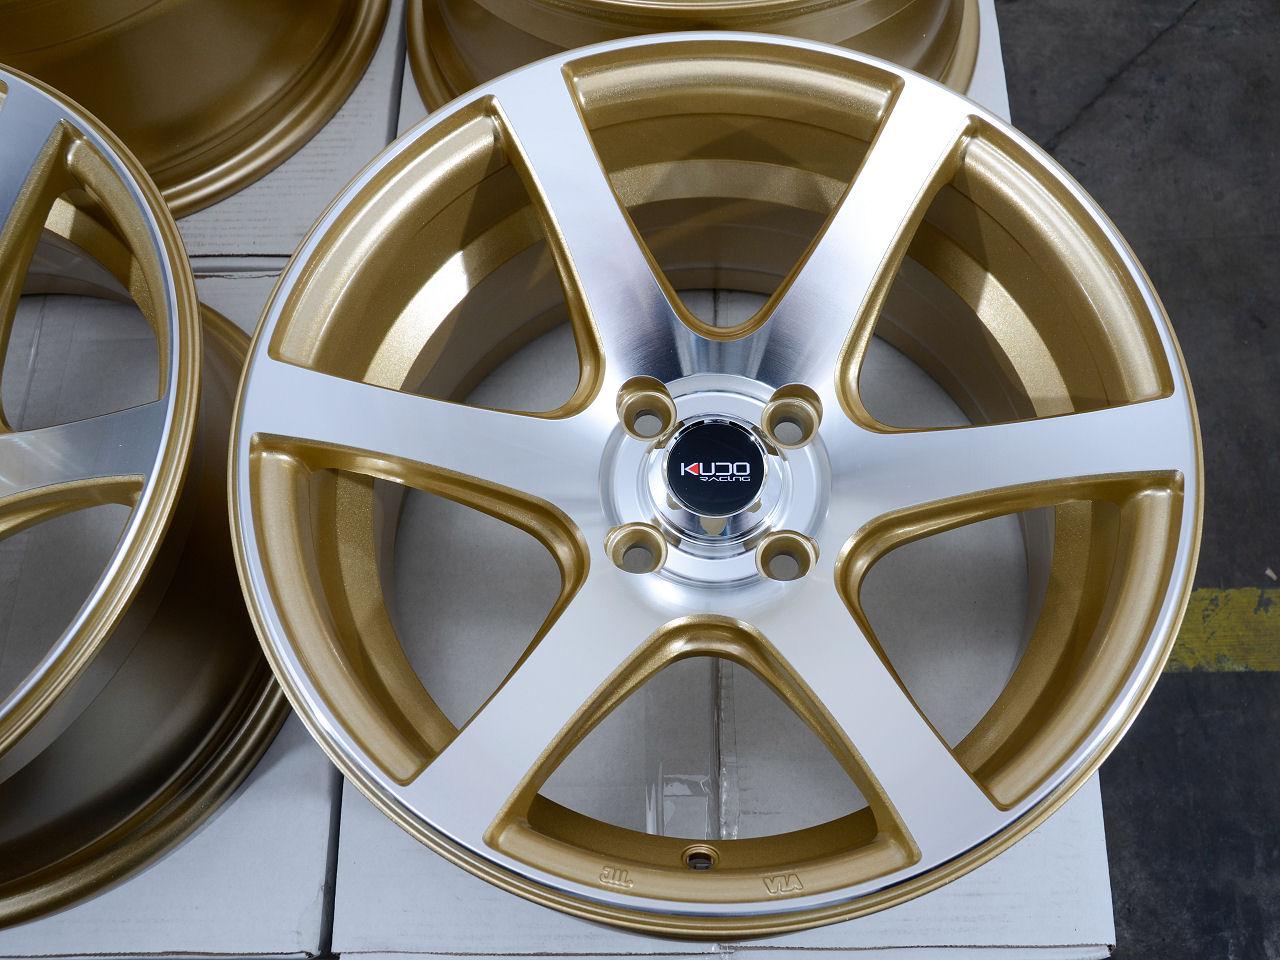 4 Aodhan V2 Gold Valve Stems Fits Honda Accord Civic Crx Prelude Del Sol S2000